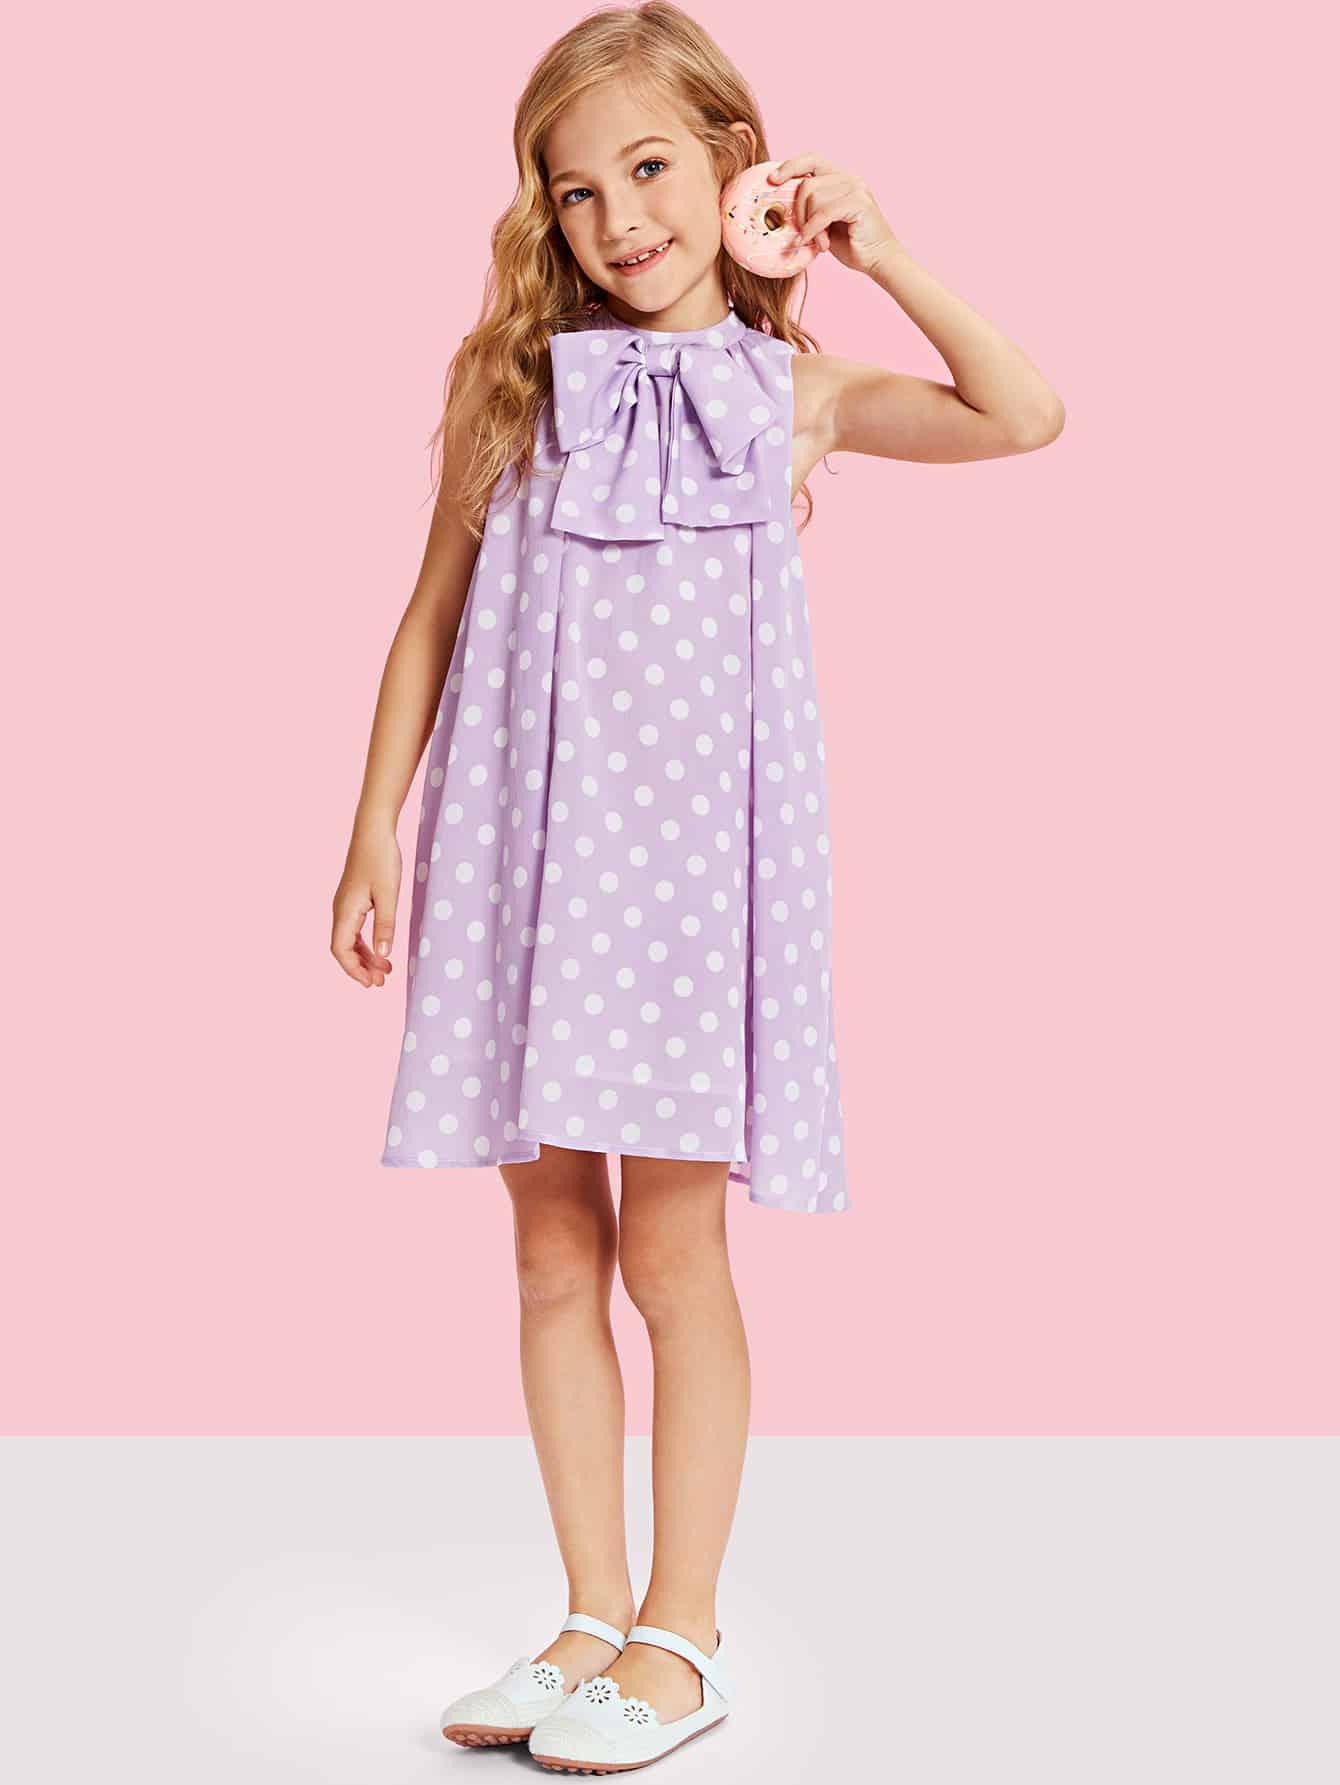 Bow Embellished Polka Dot Swing Dress low cut polka dot swing dress